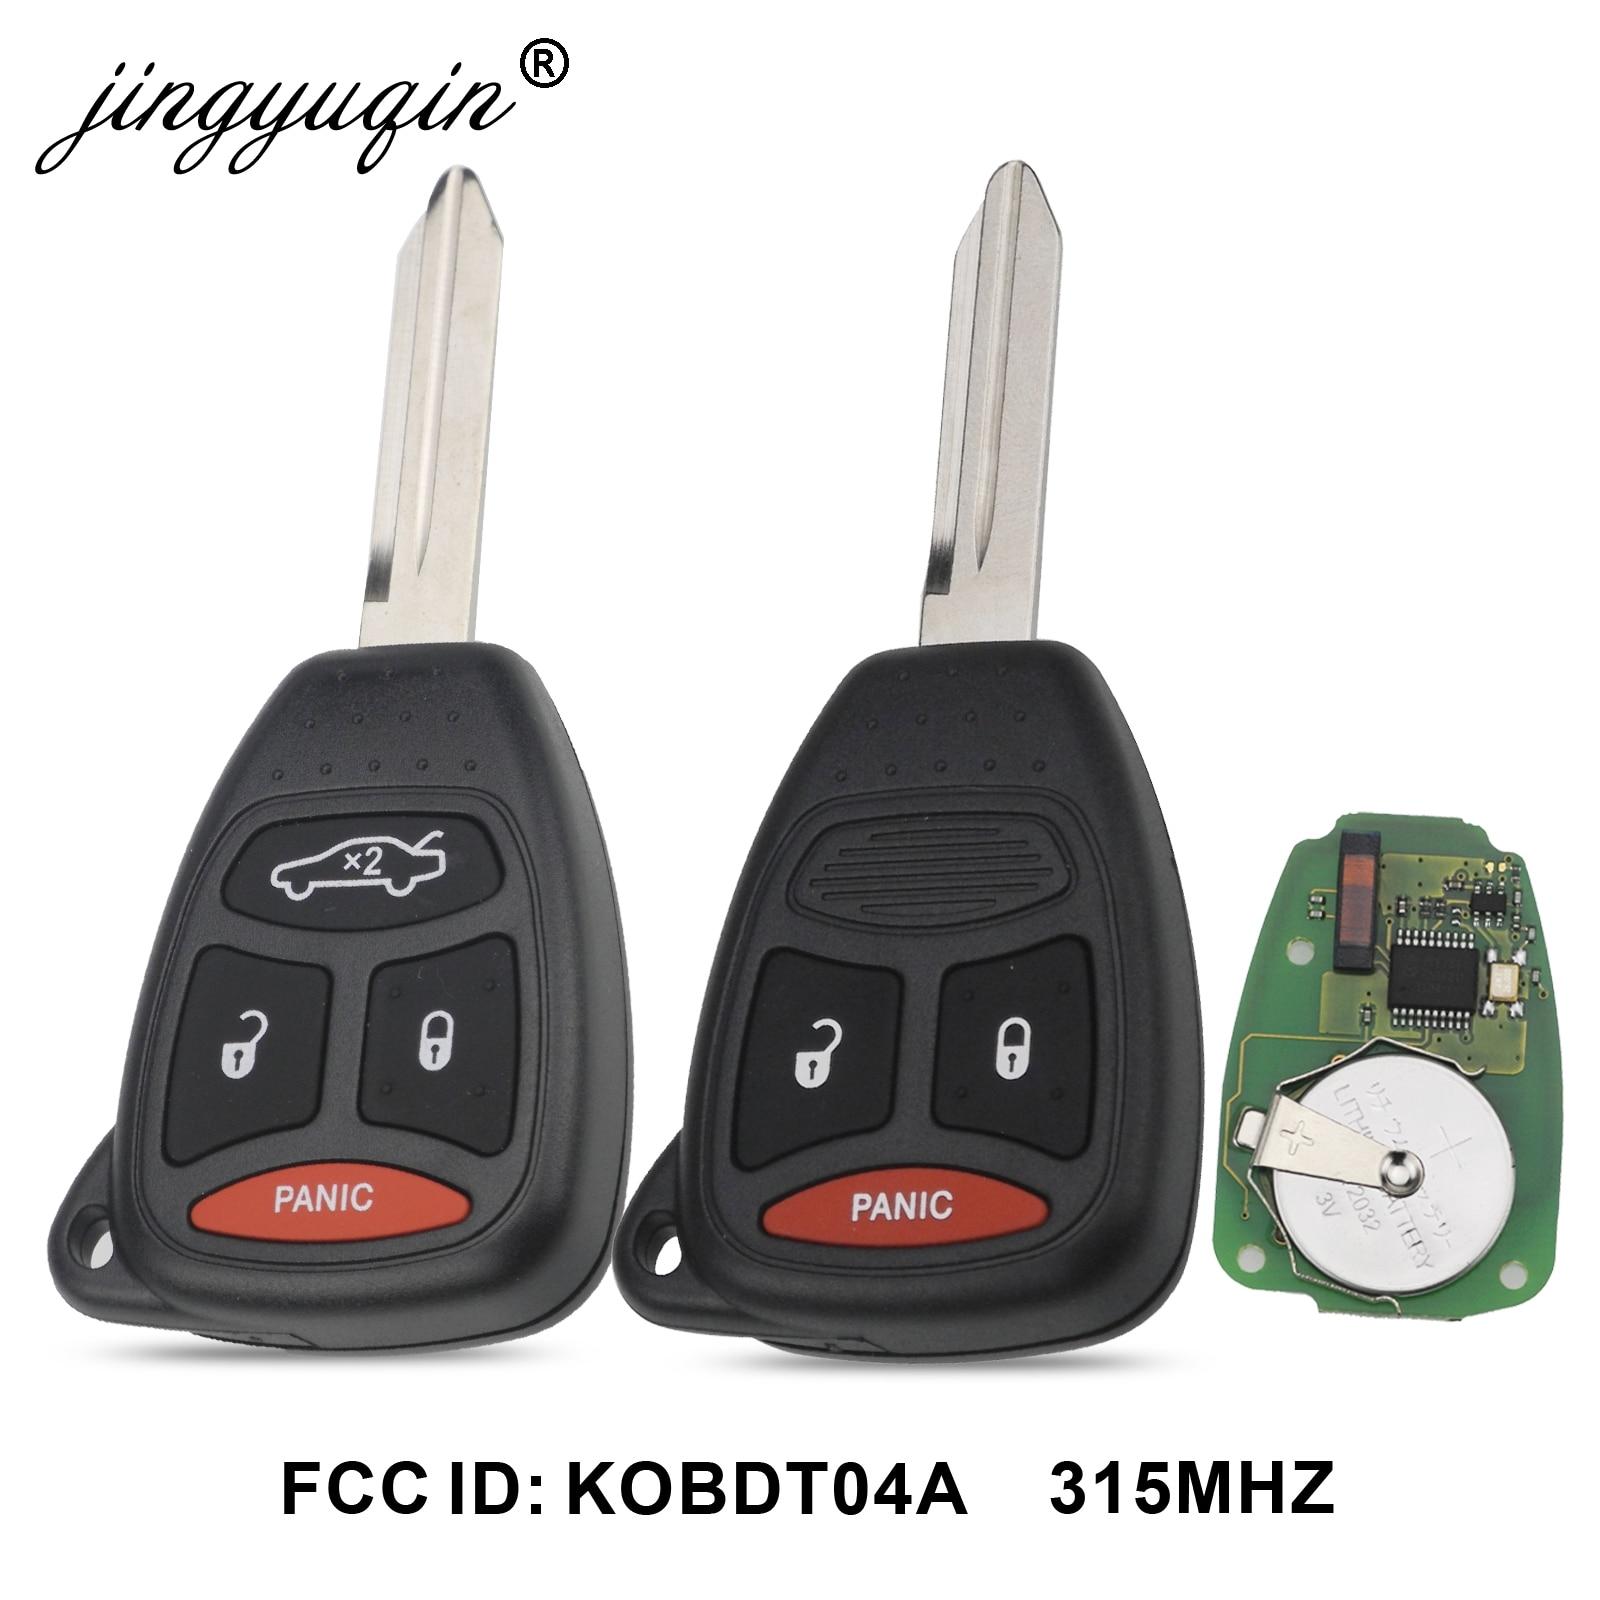 New 2007-2011 Dodge Ram Durango Dakota 4 Button Remote Key